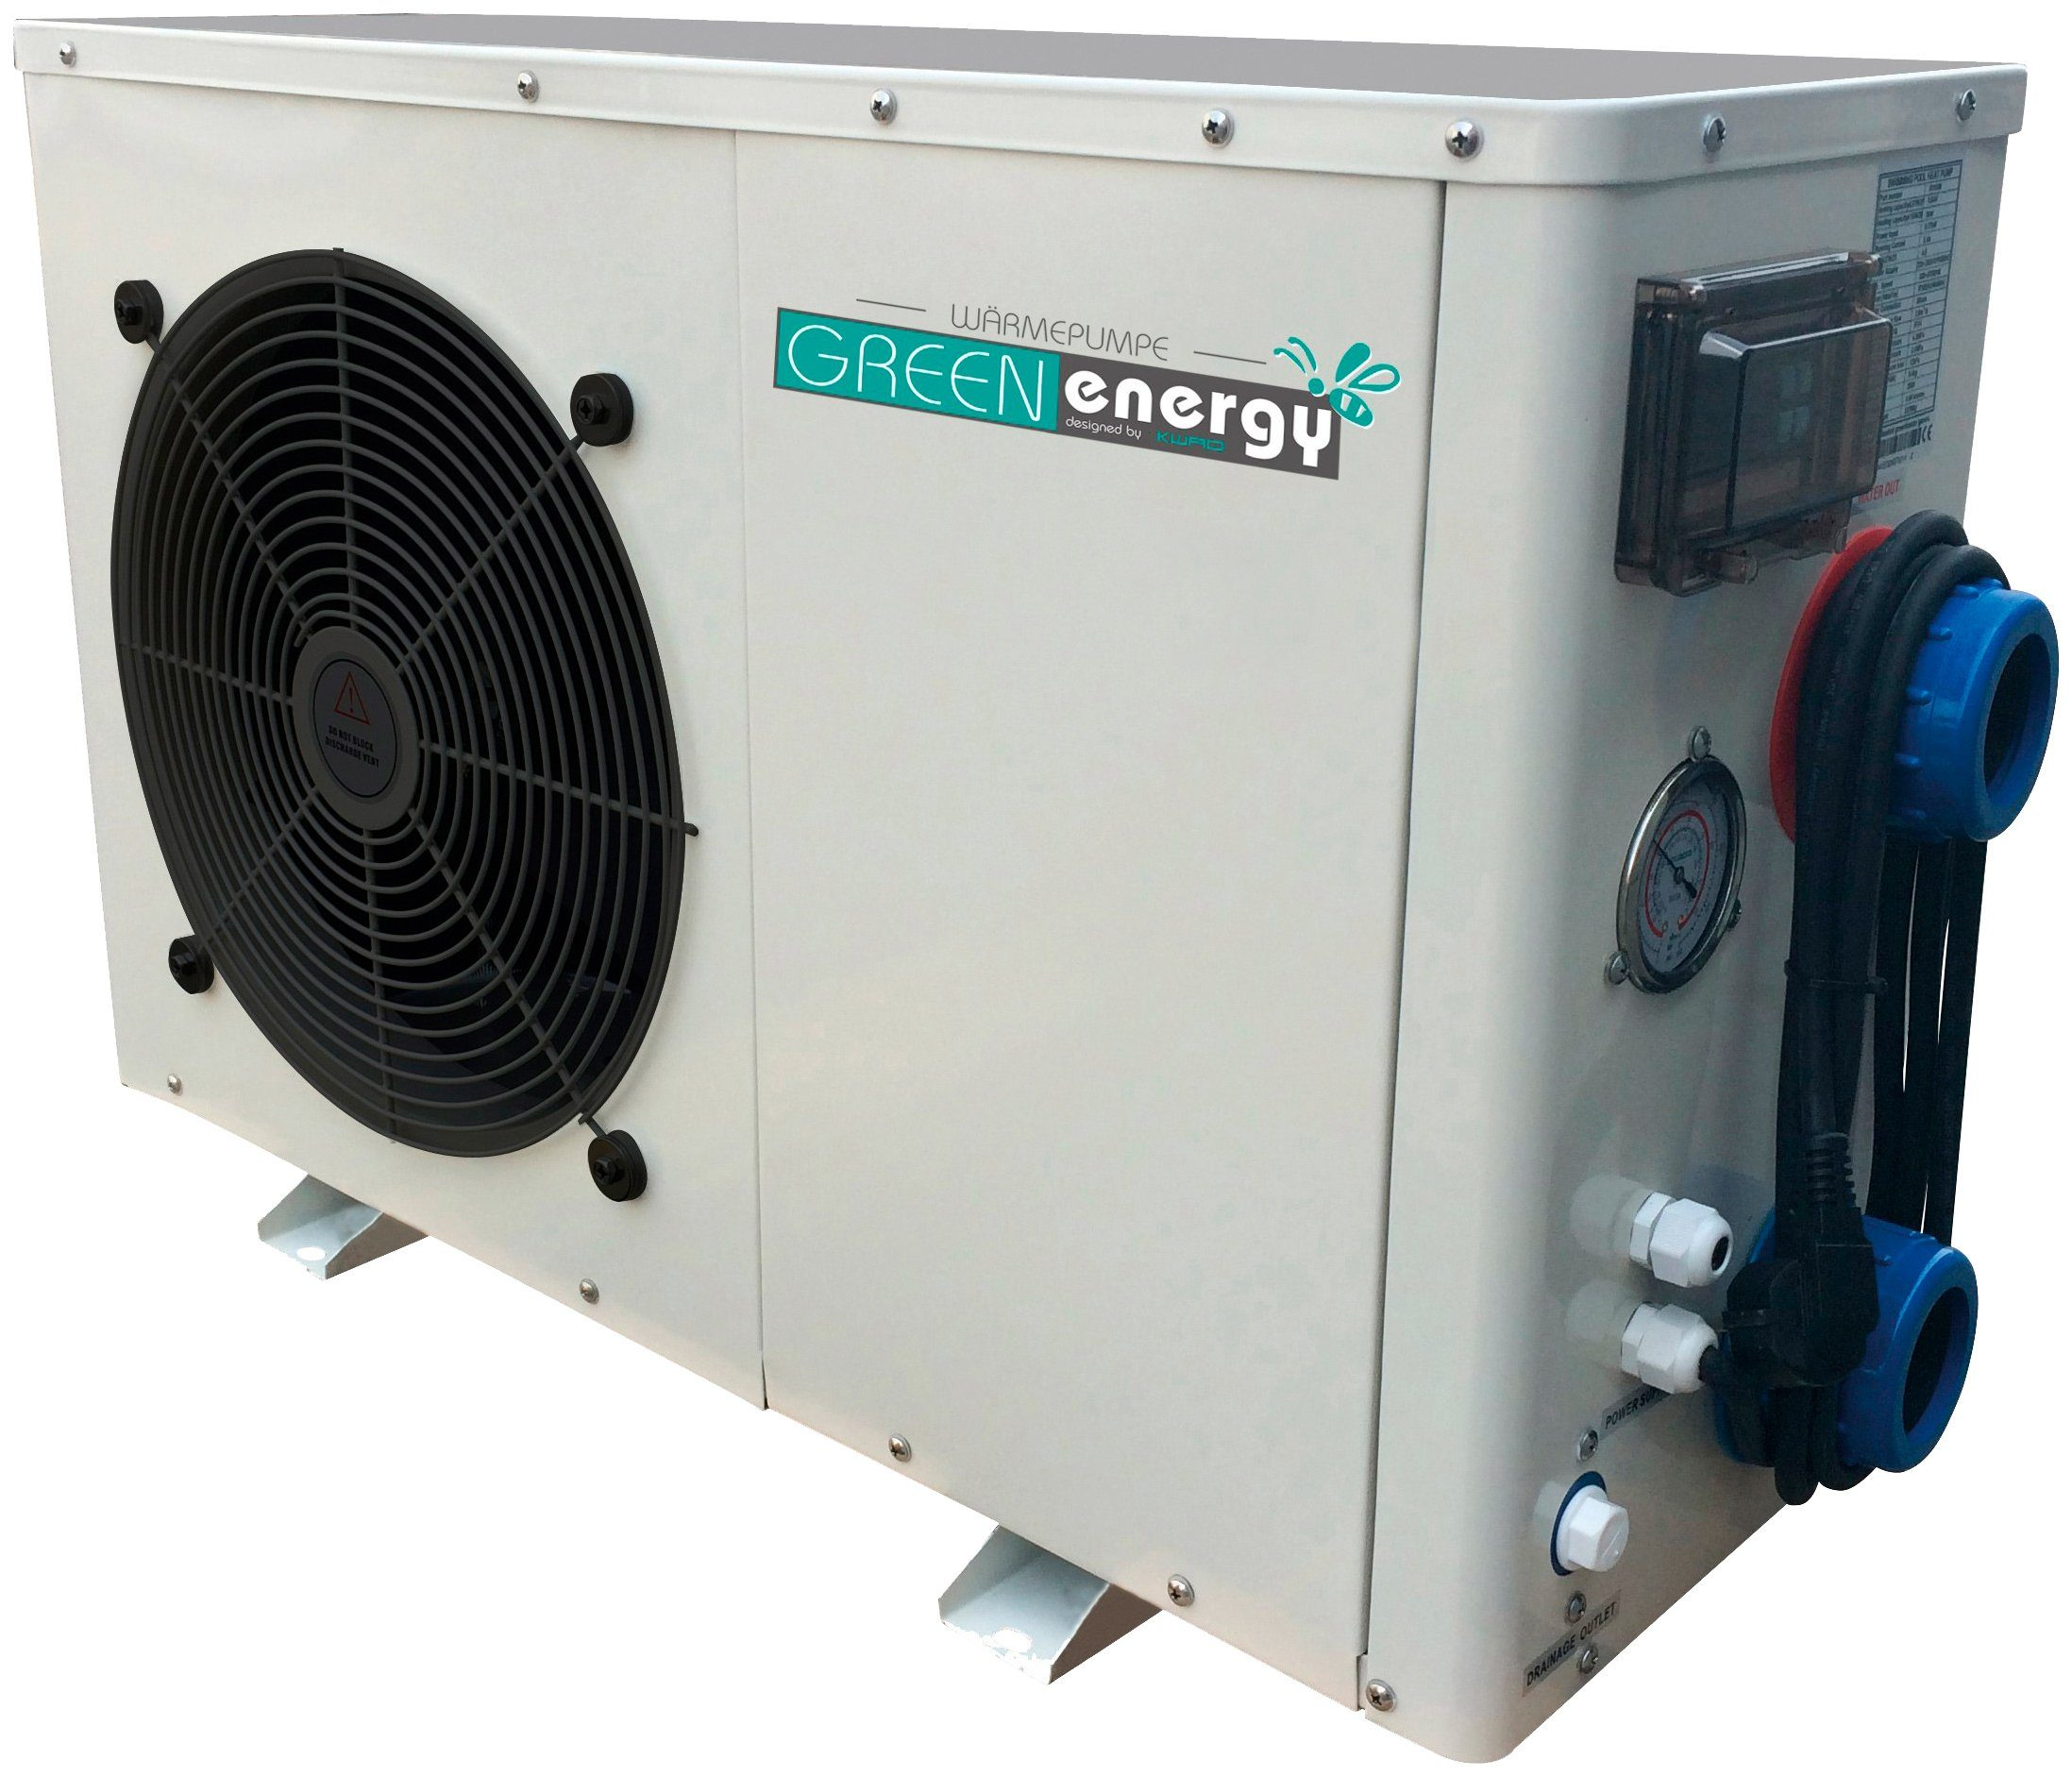 KWAD Wärmepumpen »Green Energy 8«, für Pools bis 30.000 l